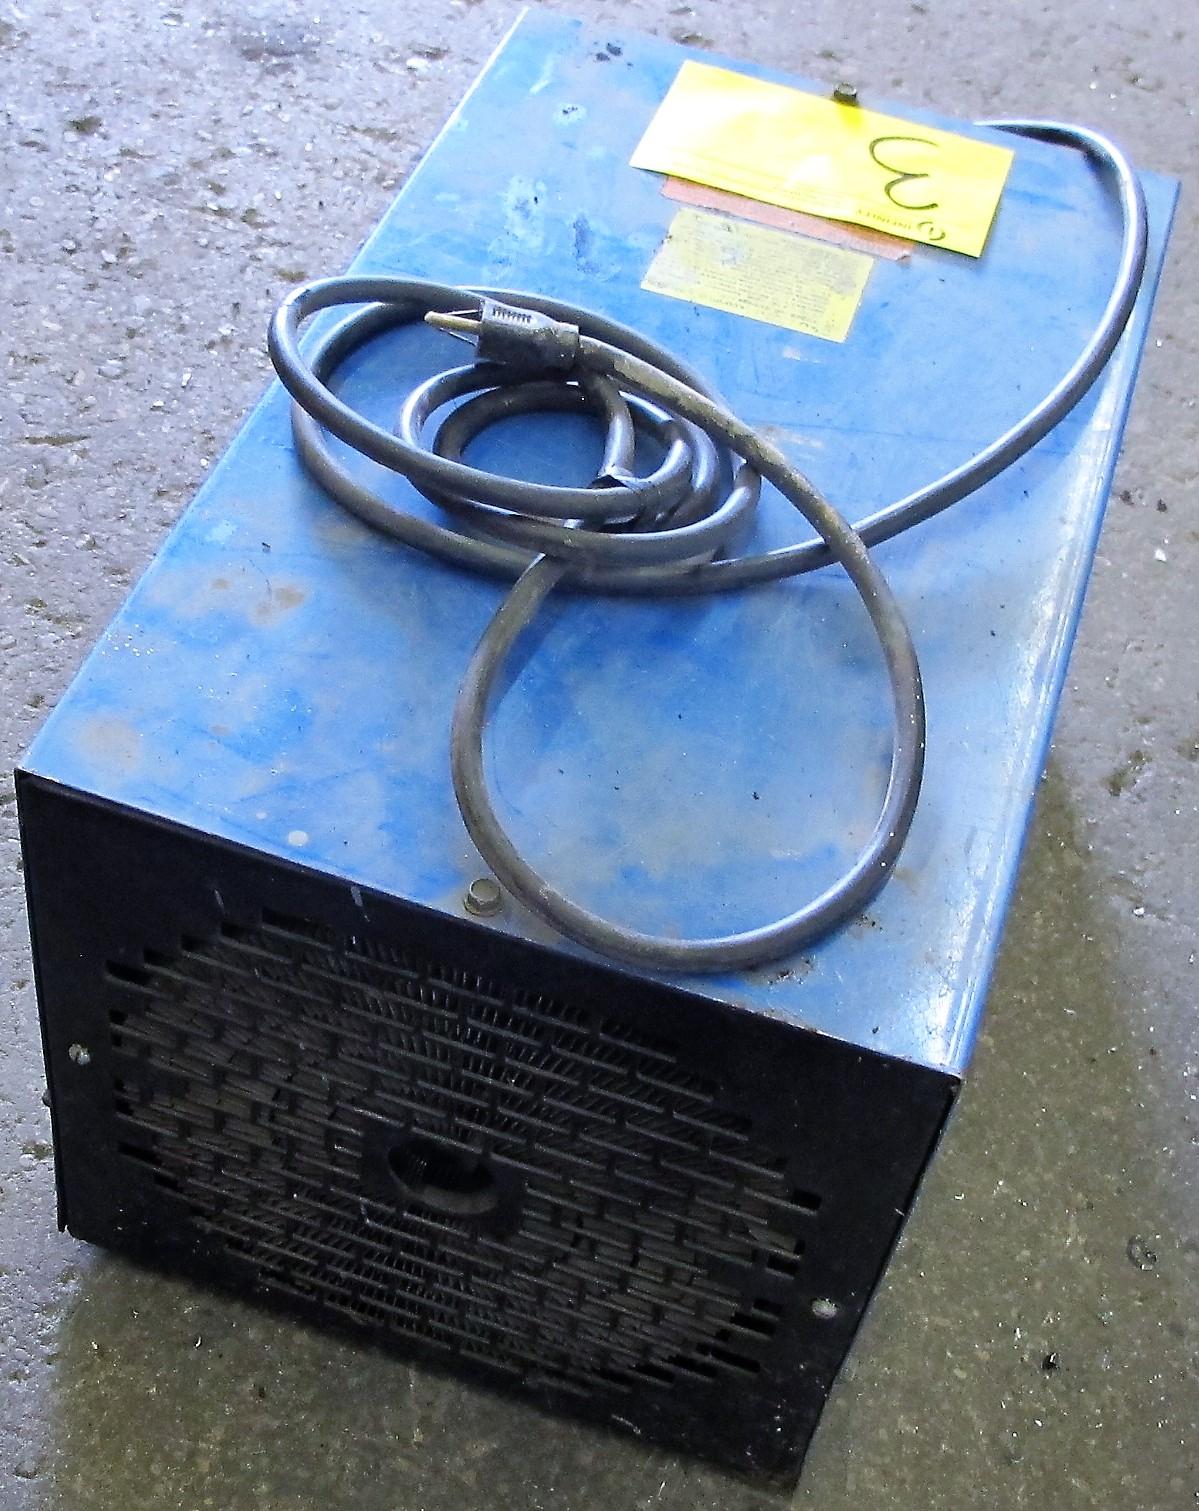 MILLER RADIATOR/COOLING SYSTEM - Image 2 of 2